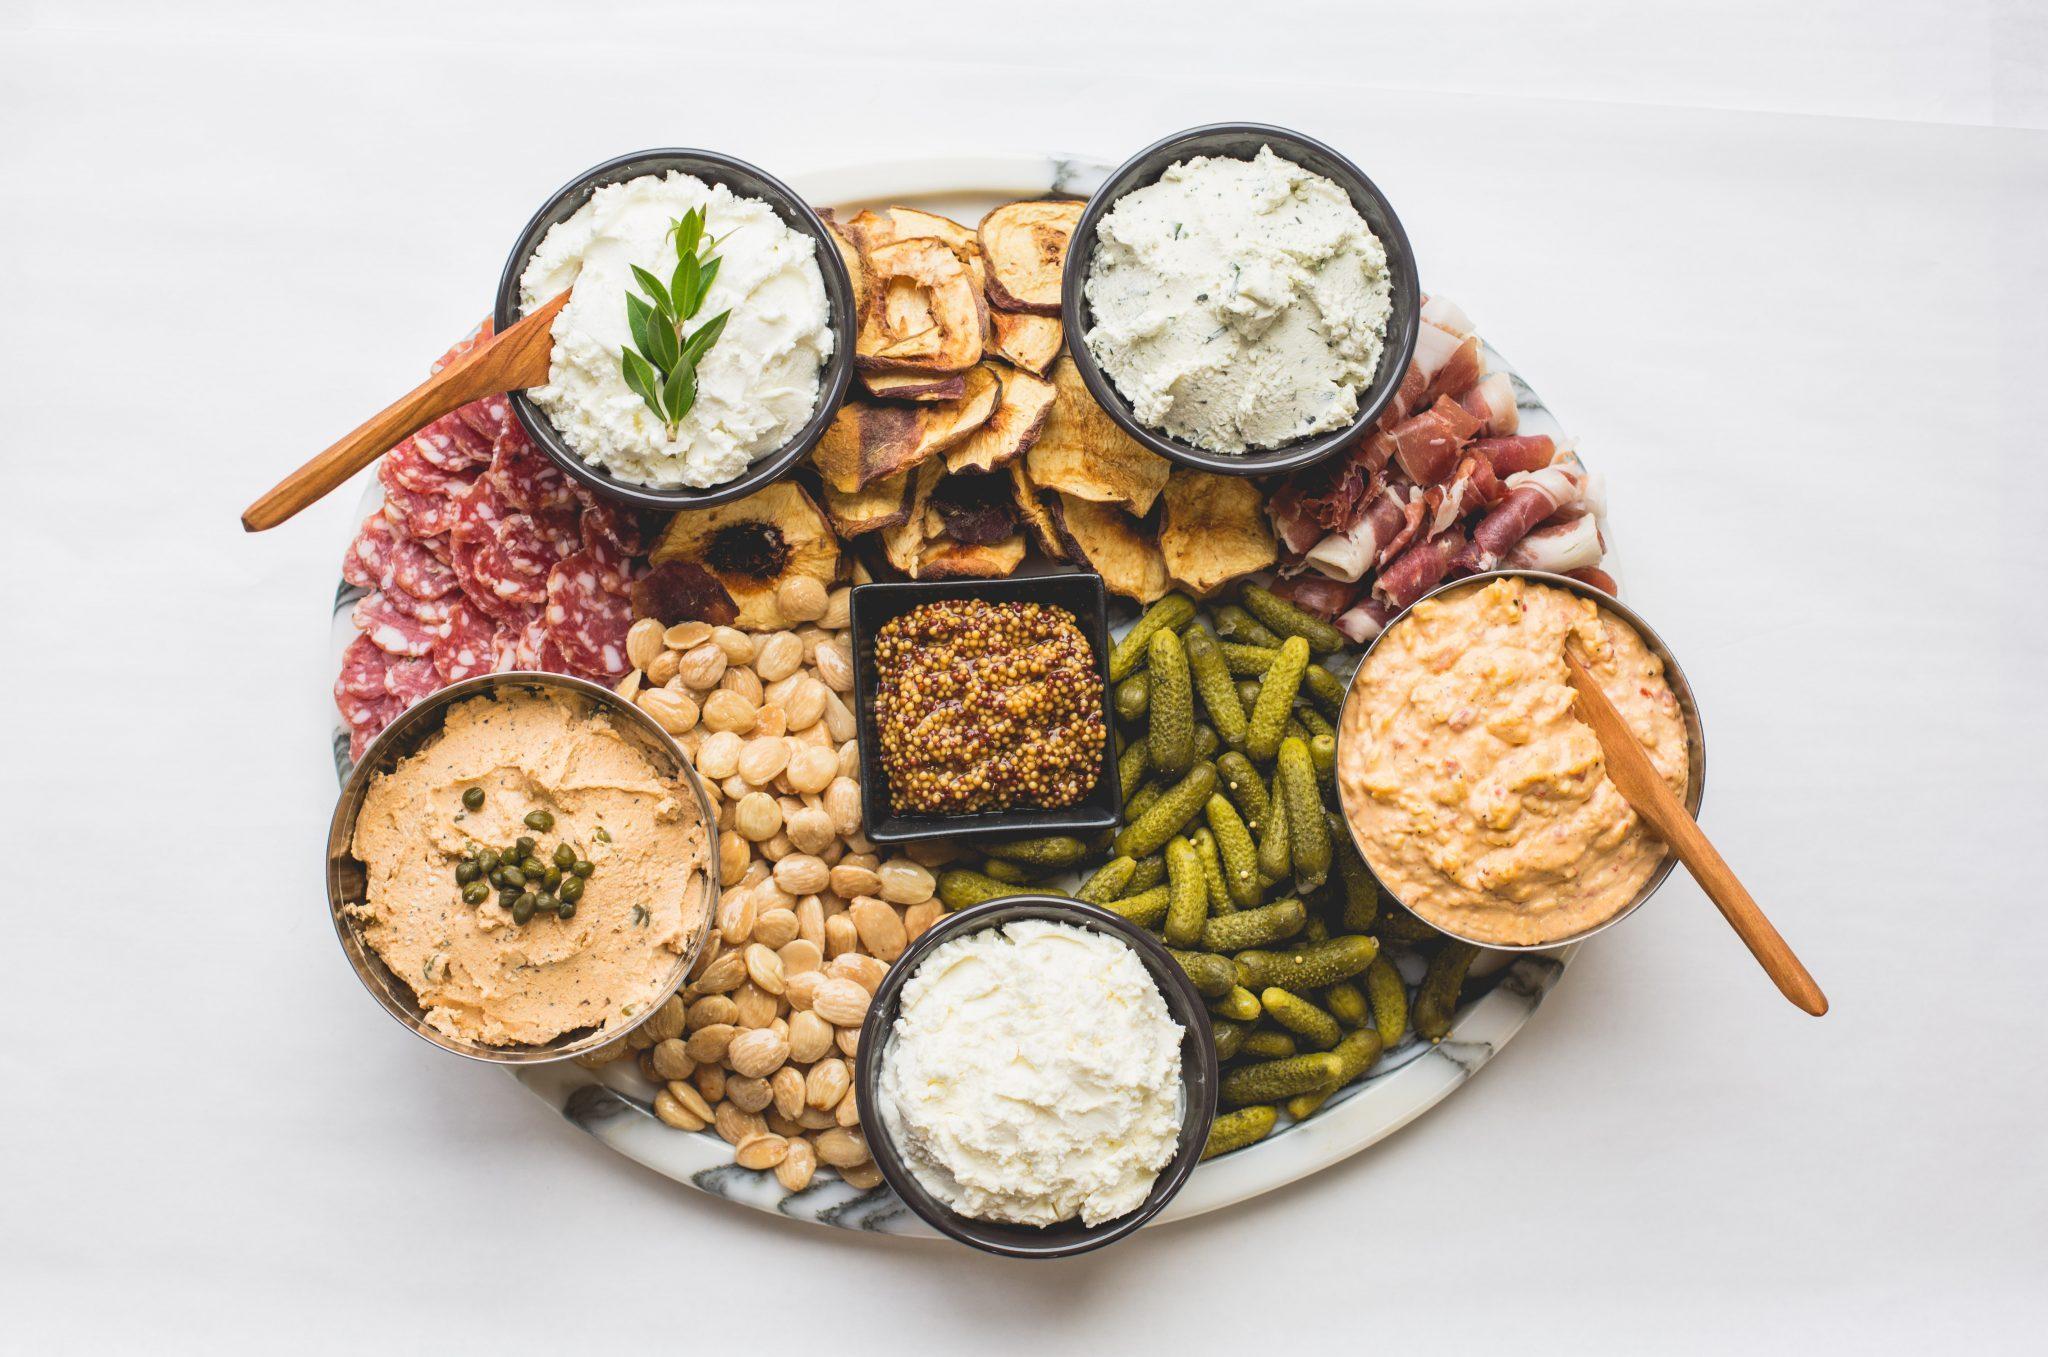 Creamery Spreads Cheese Platter Zingerman S Creamery